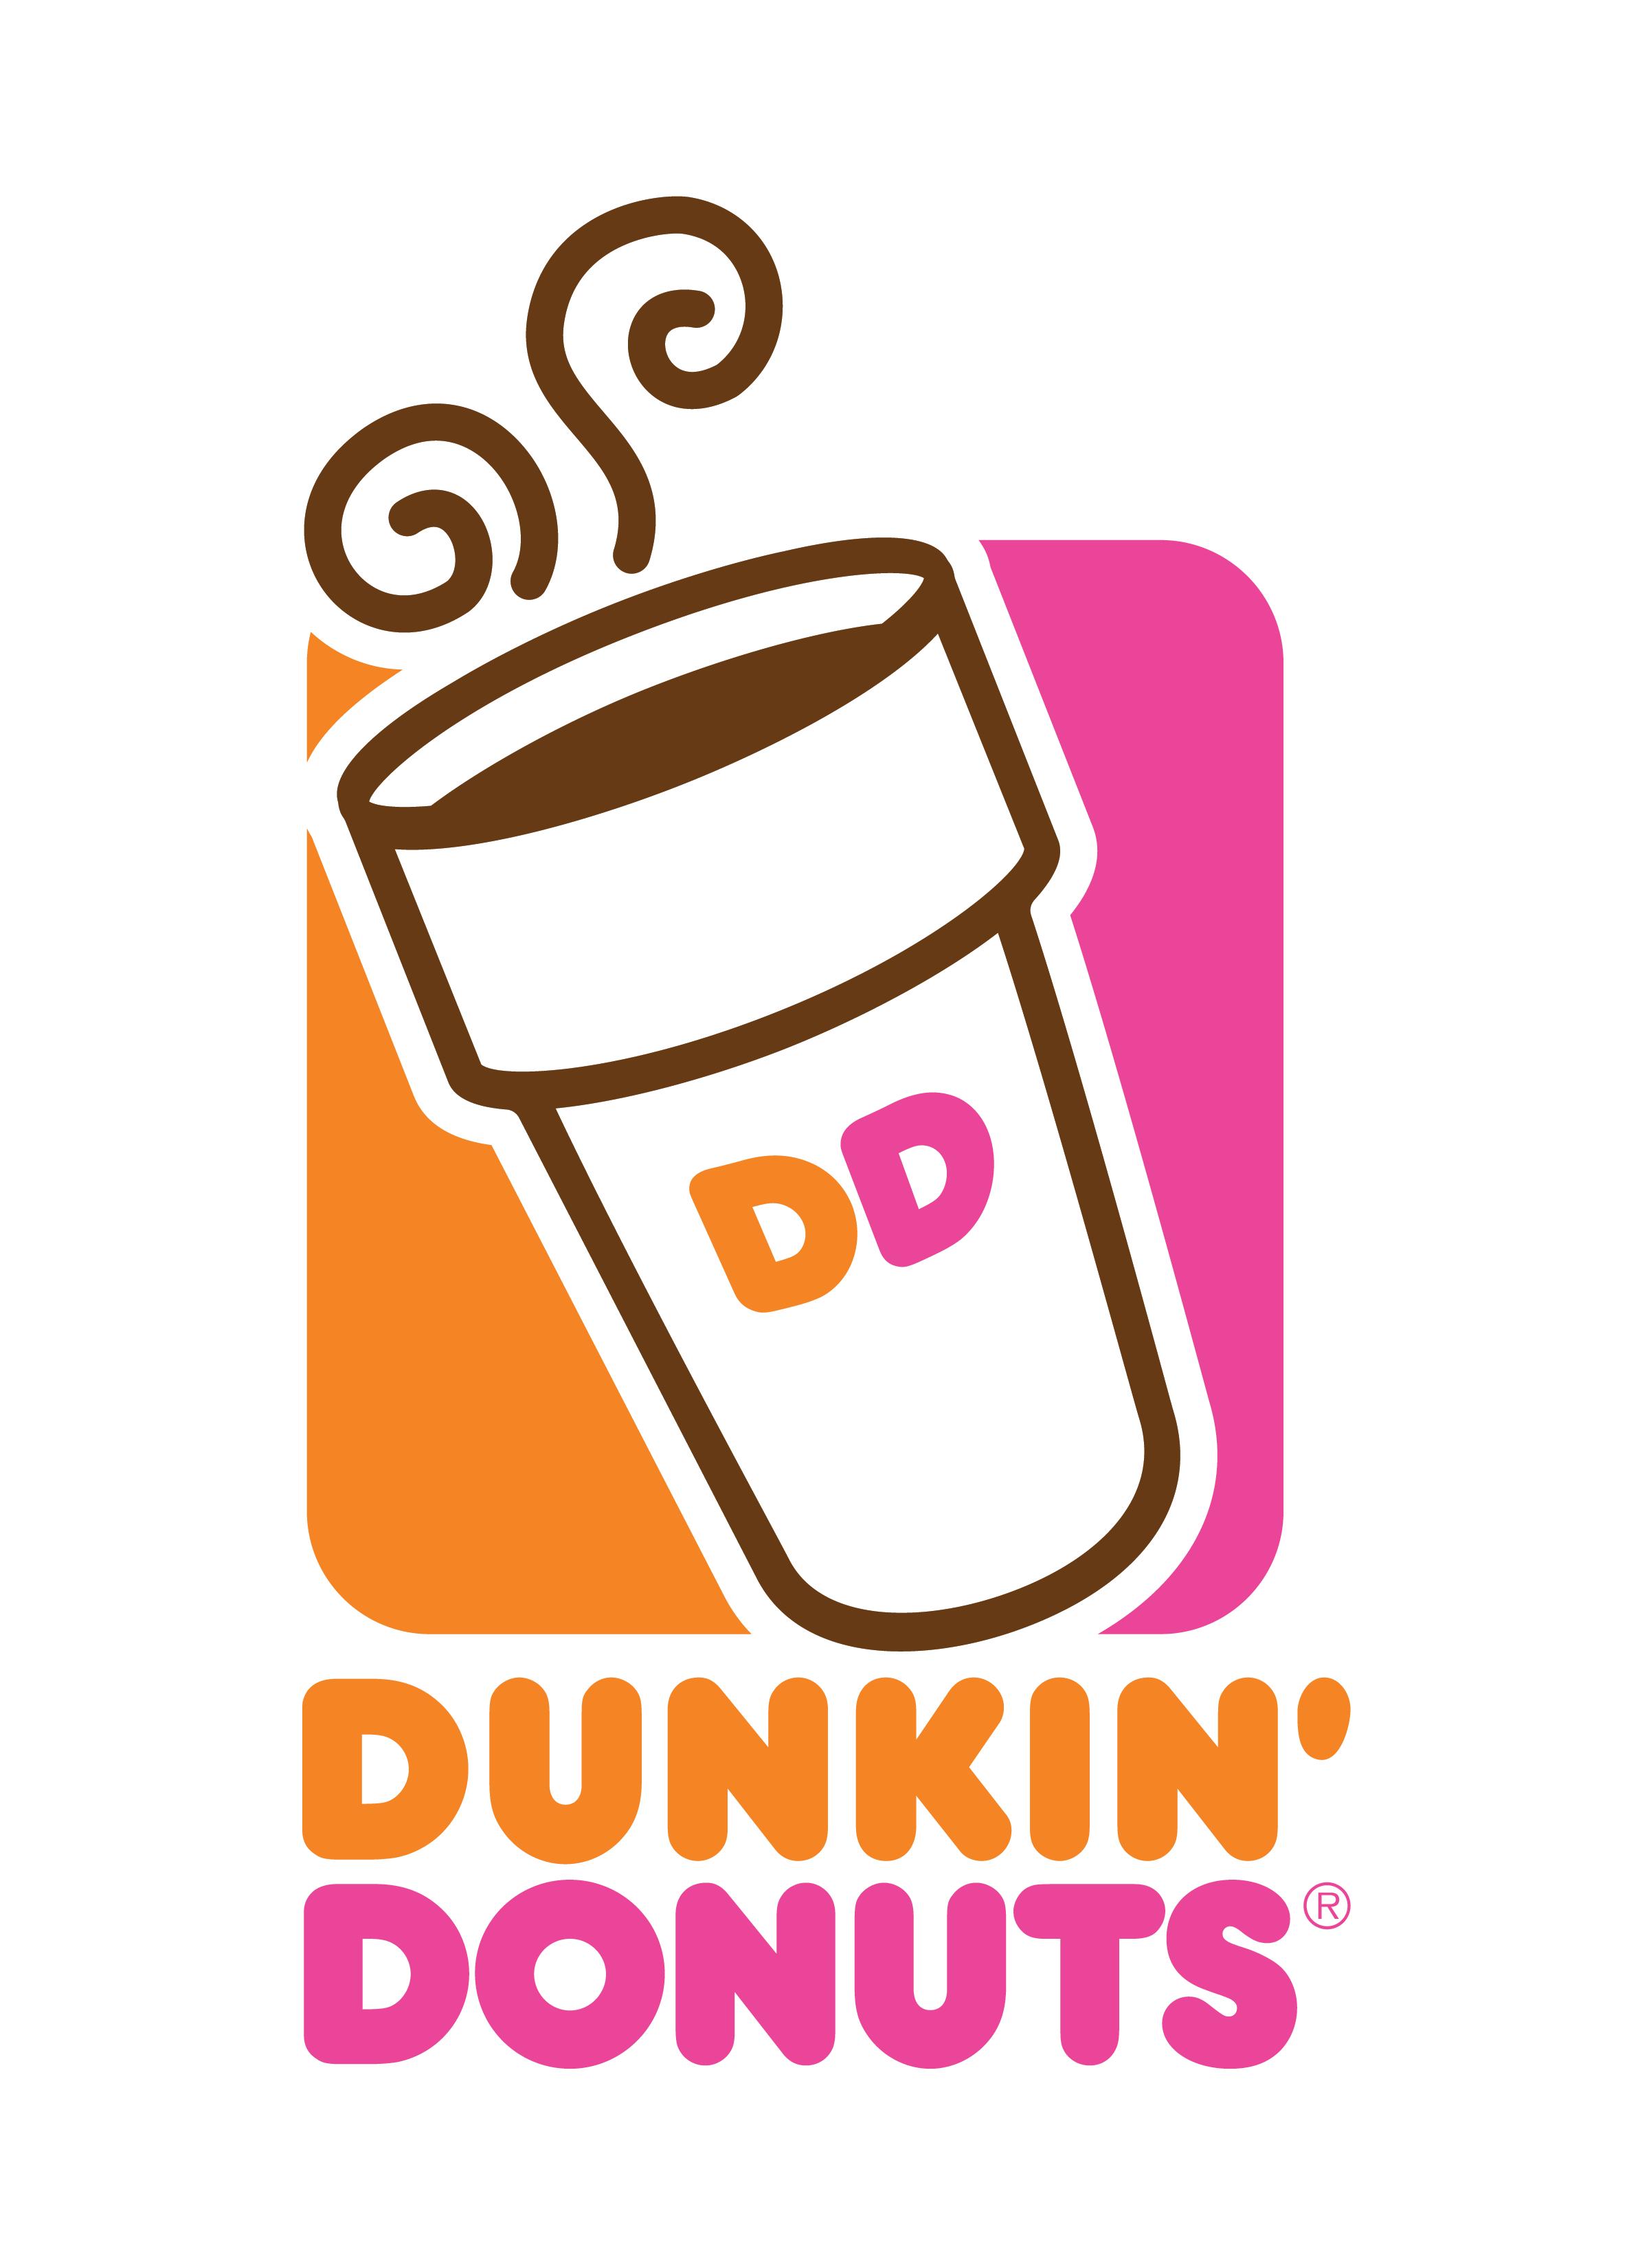 dunkin donuts png logo